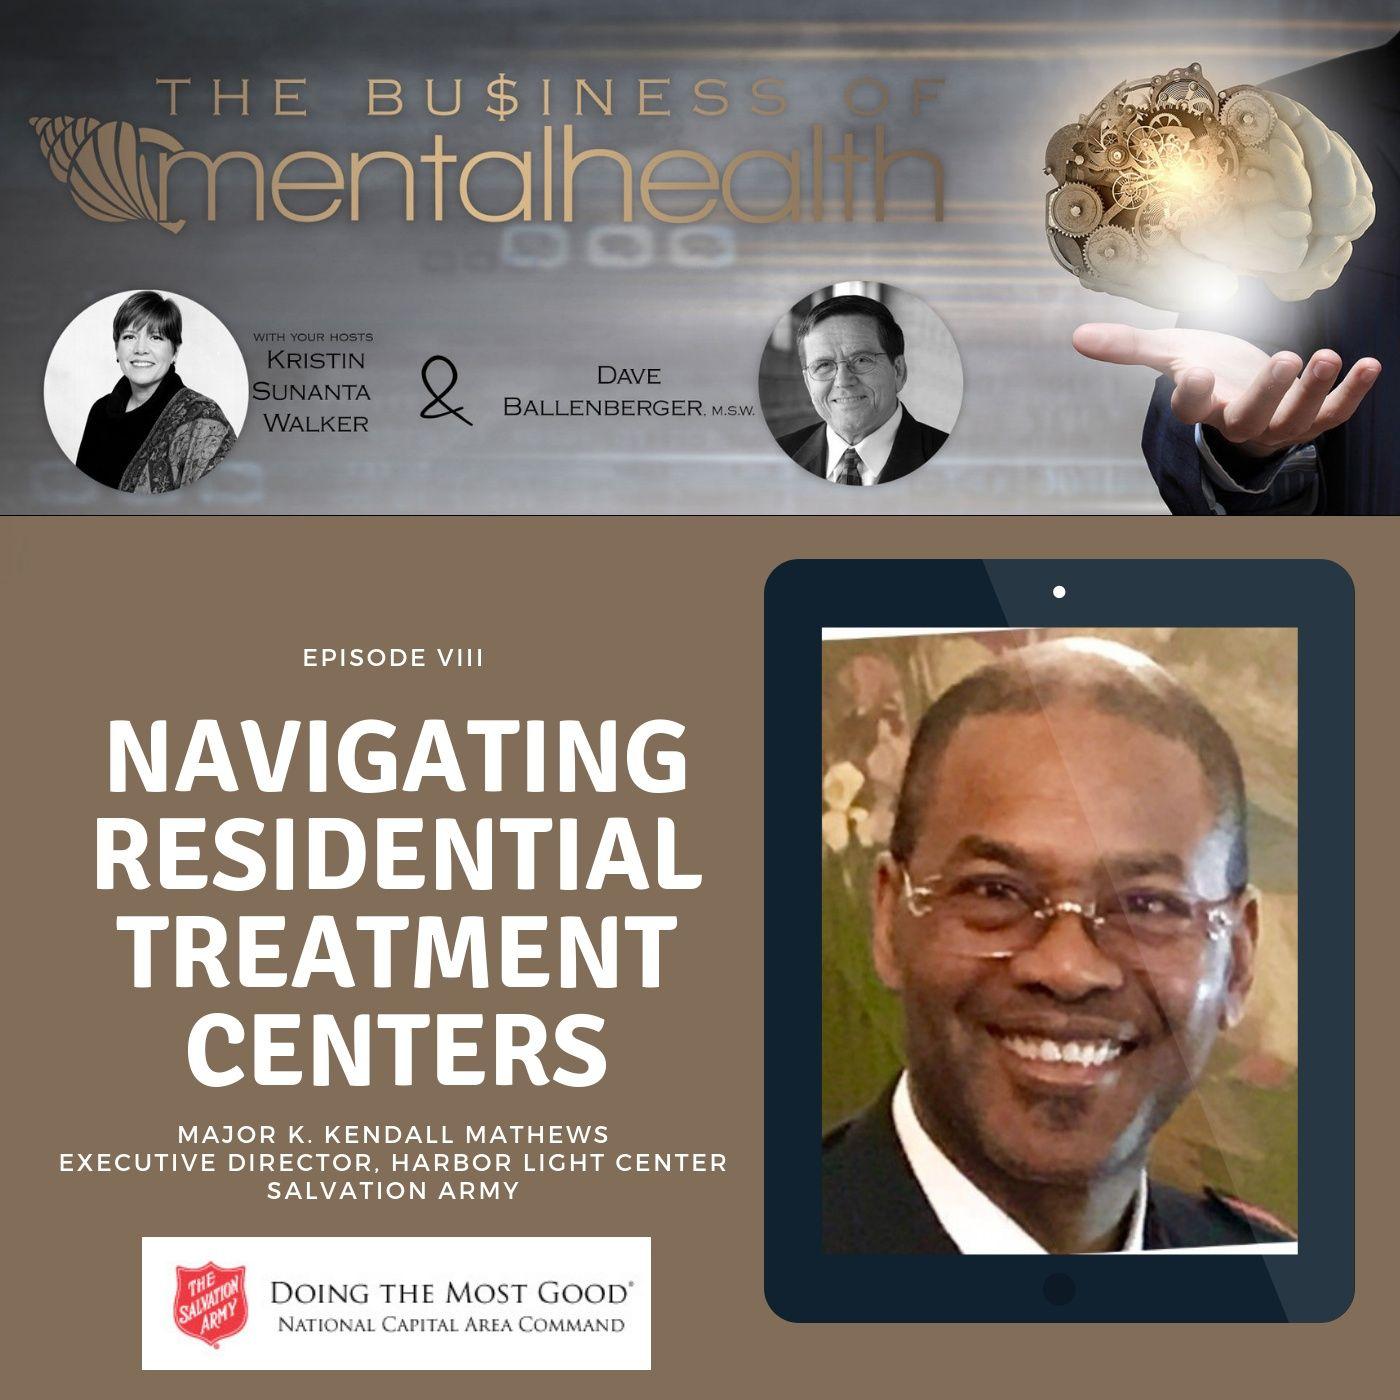 Mental Health News Radio - Mental Health Business: Major Kendall Mathews on Navigating Residential Treatment Centers